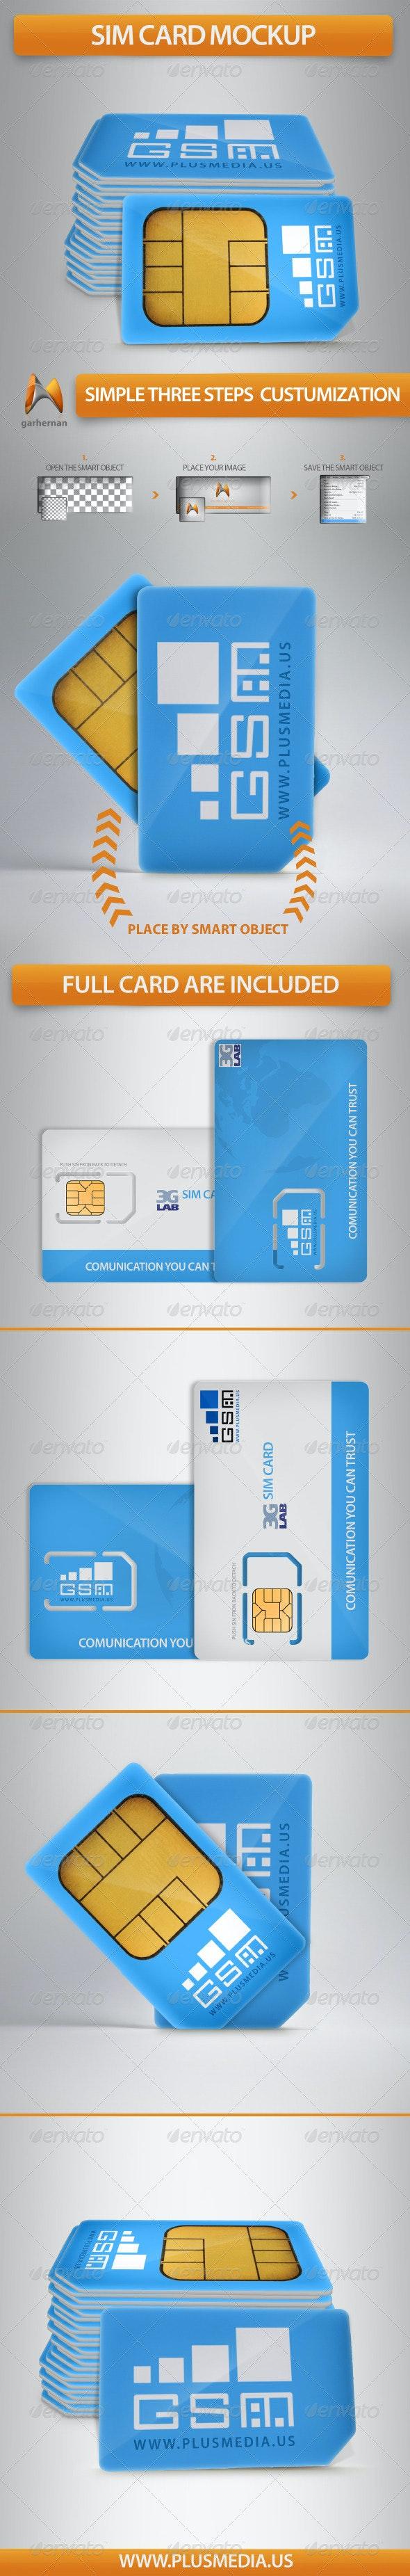 Sim Card Mockup - Miscellaneous Product Mock-Ups